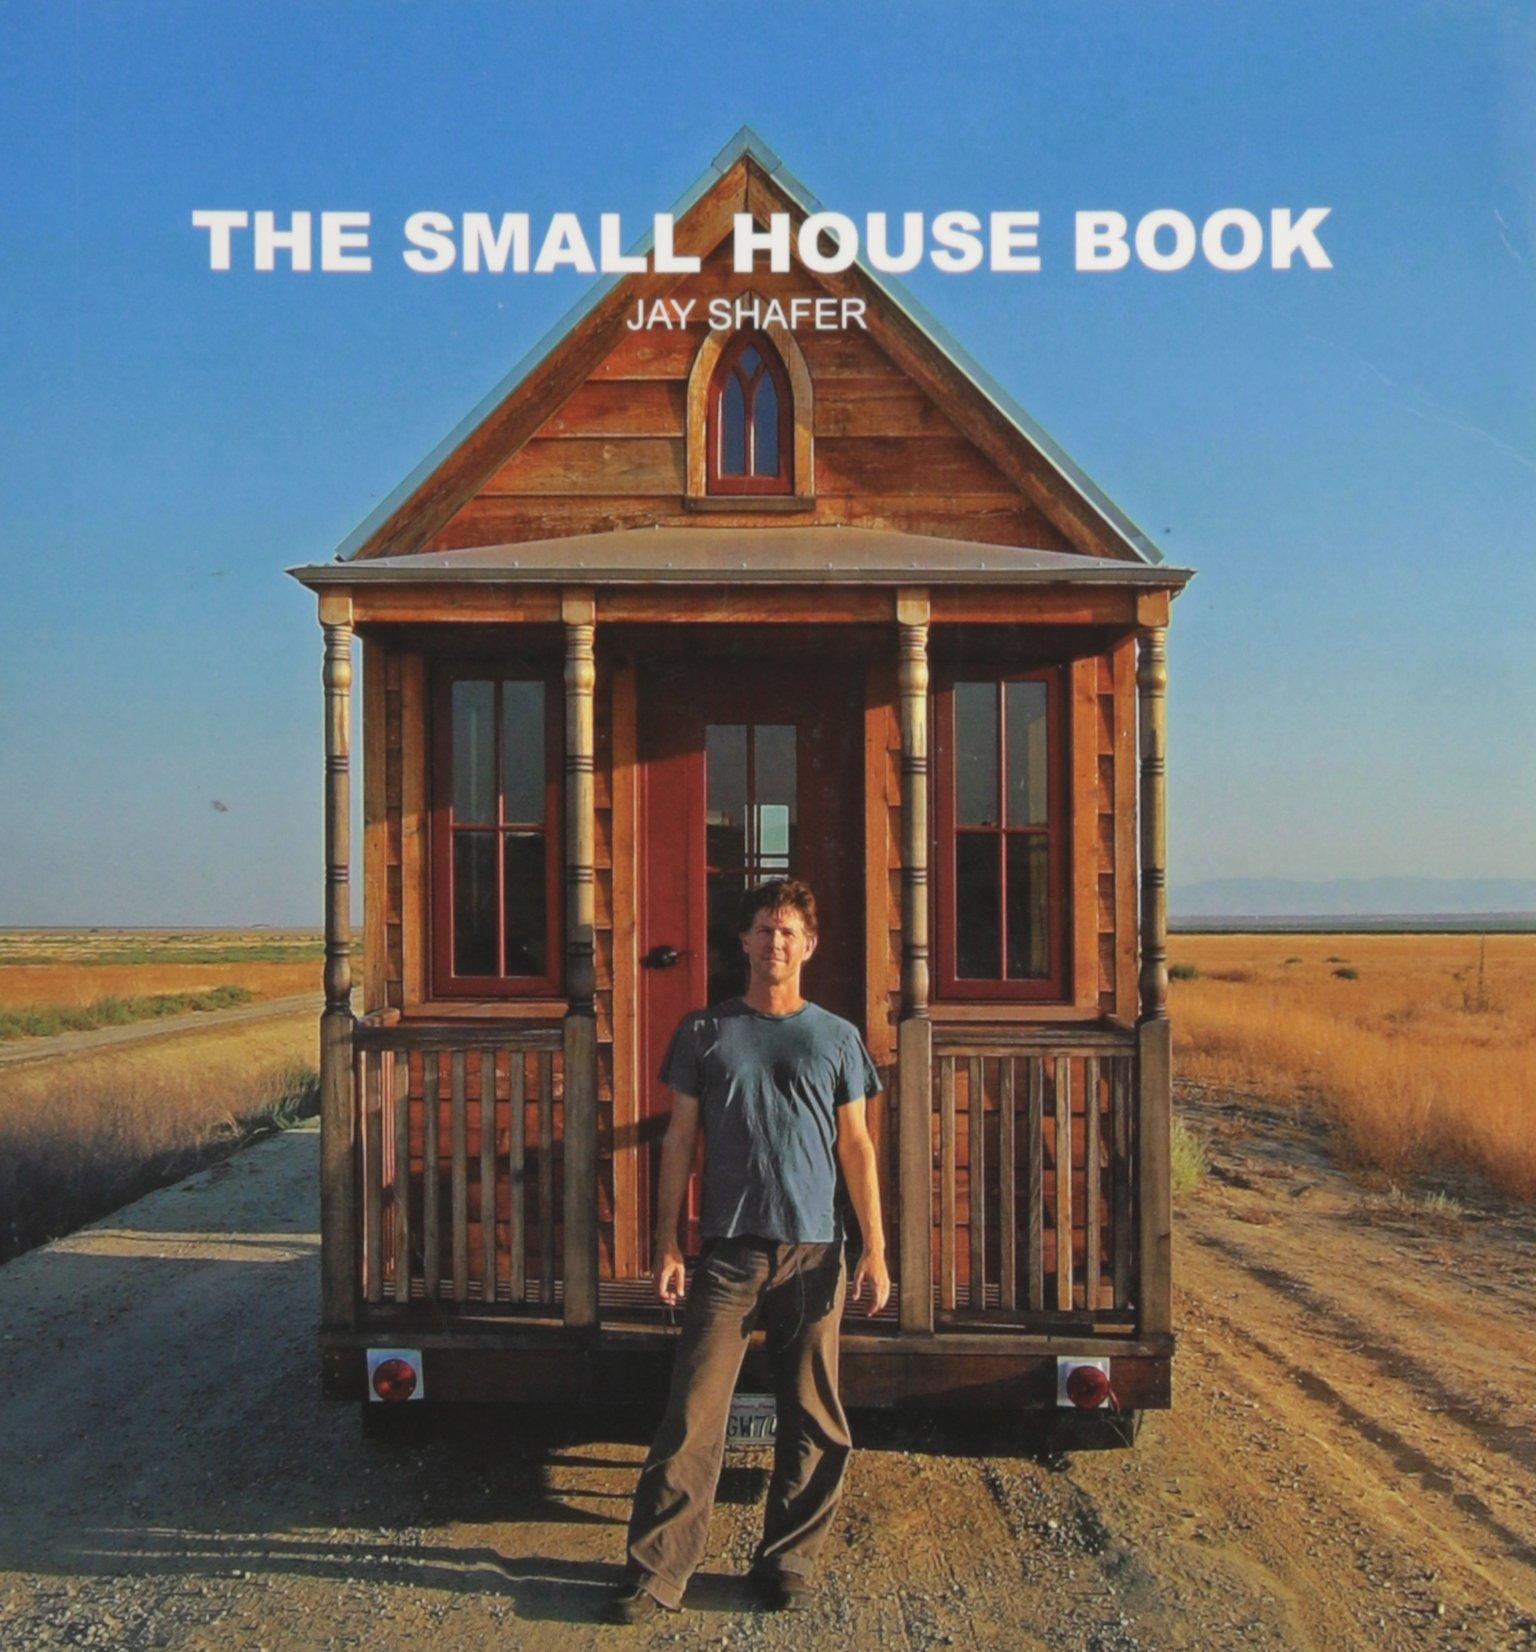 The Small House Book: Jay Shafer, Photos: 9781607435648: Amazon.com: Books